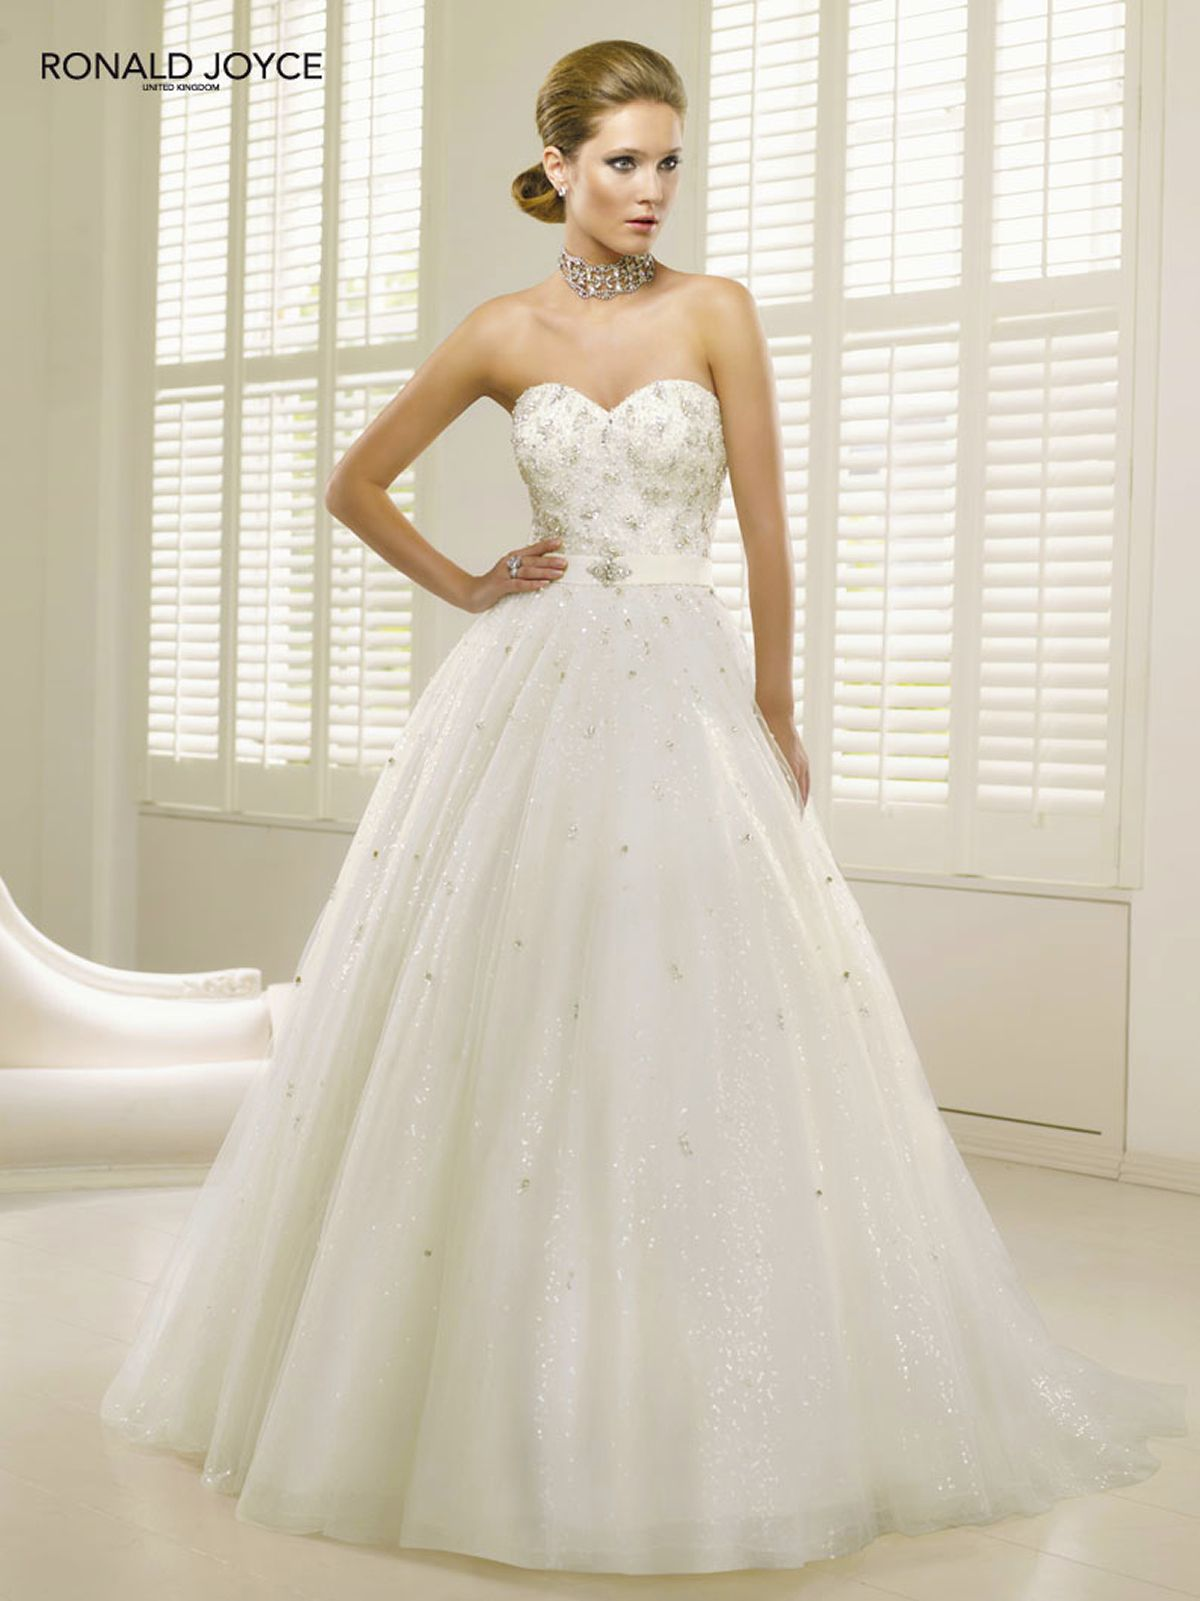 Buy Wedding Dress Ronald Joyce Padova 2013 At Cheap Price